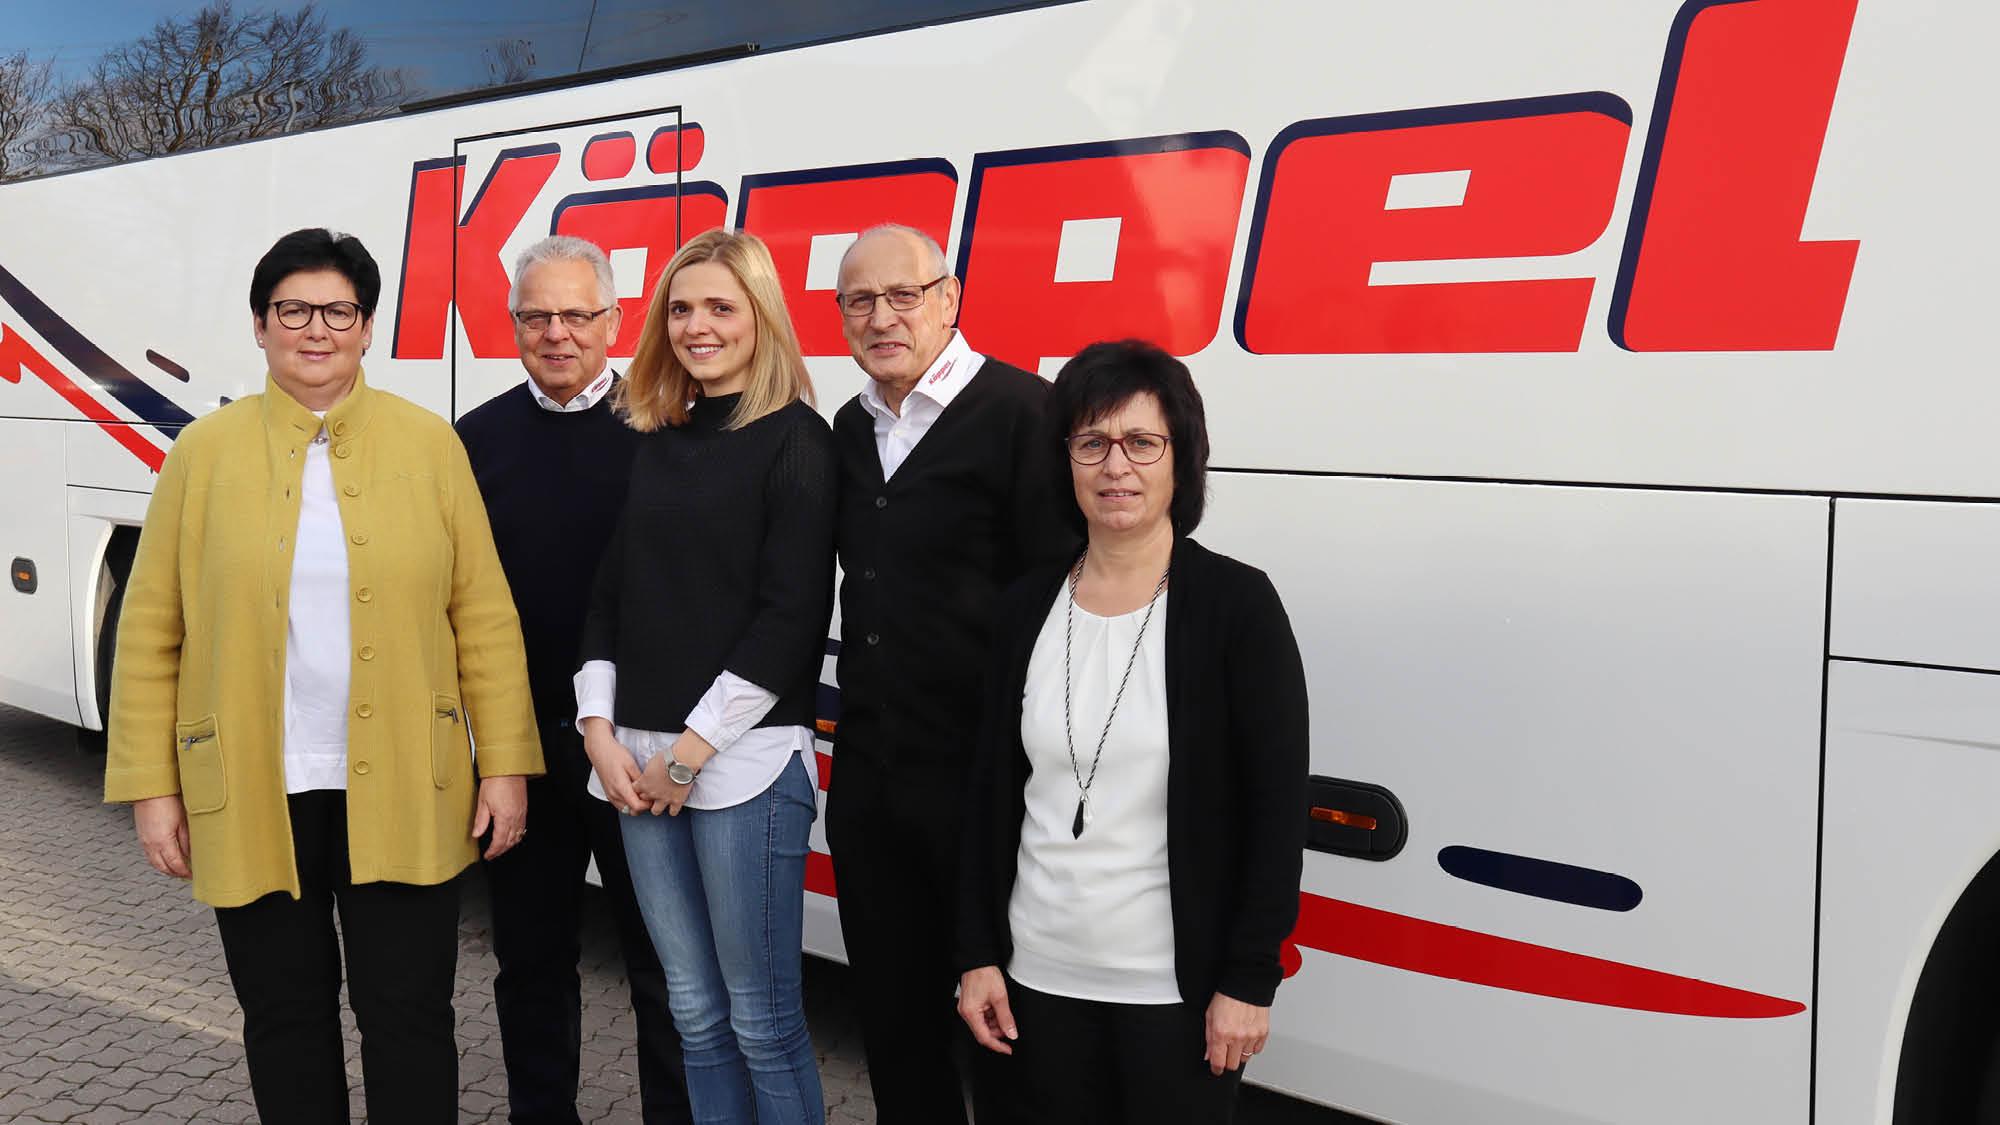 Köppel - Ellwangen - Website - Büroteam - 2019-12 - 02